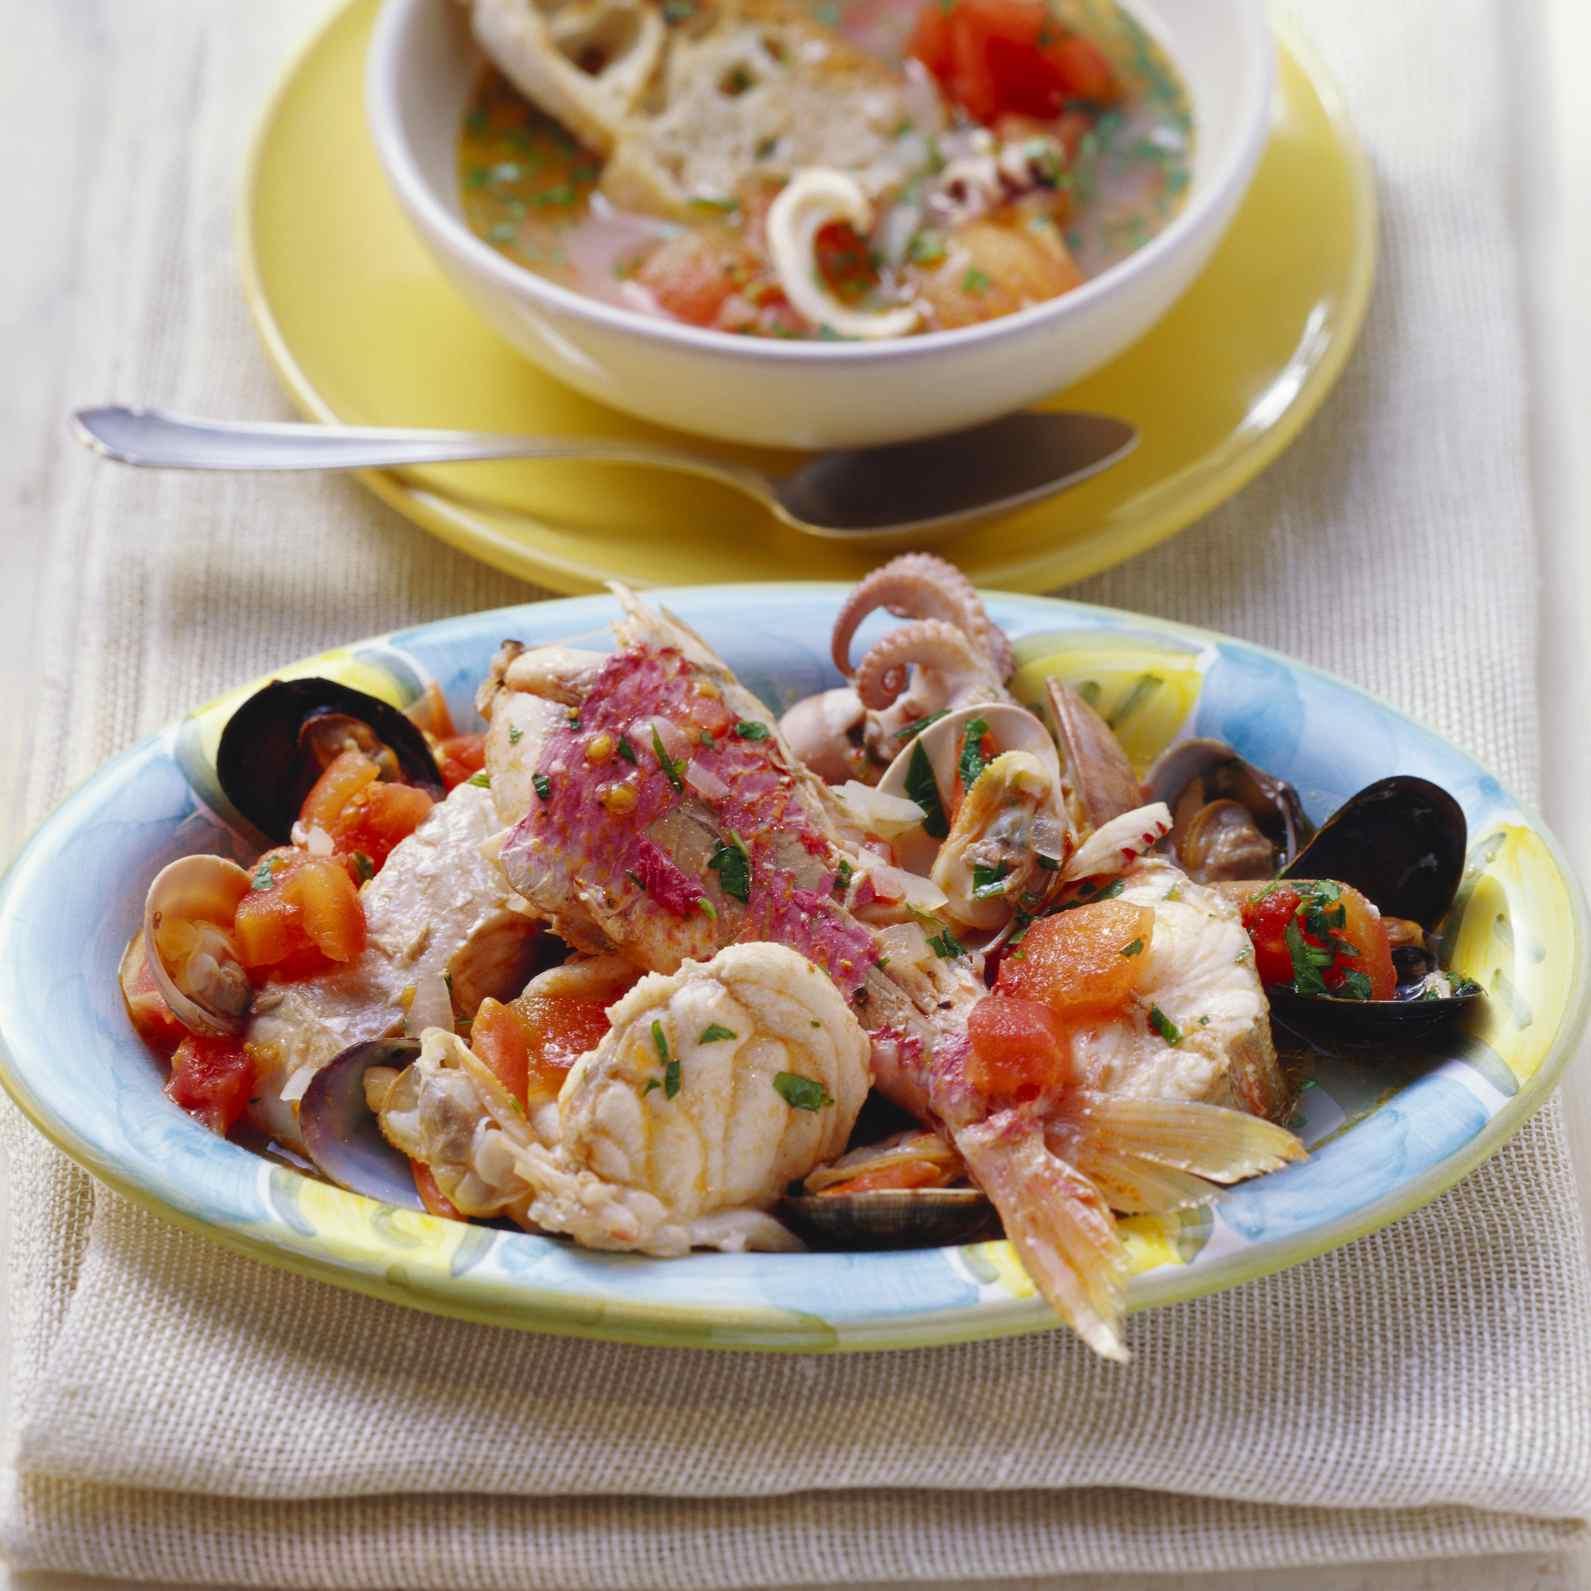 Cacciucco livornese (fish stew), Tuscany, Italy